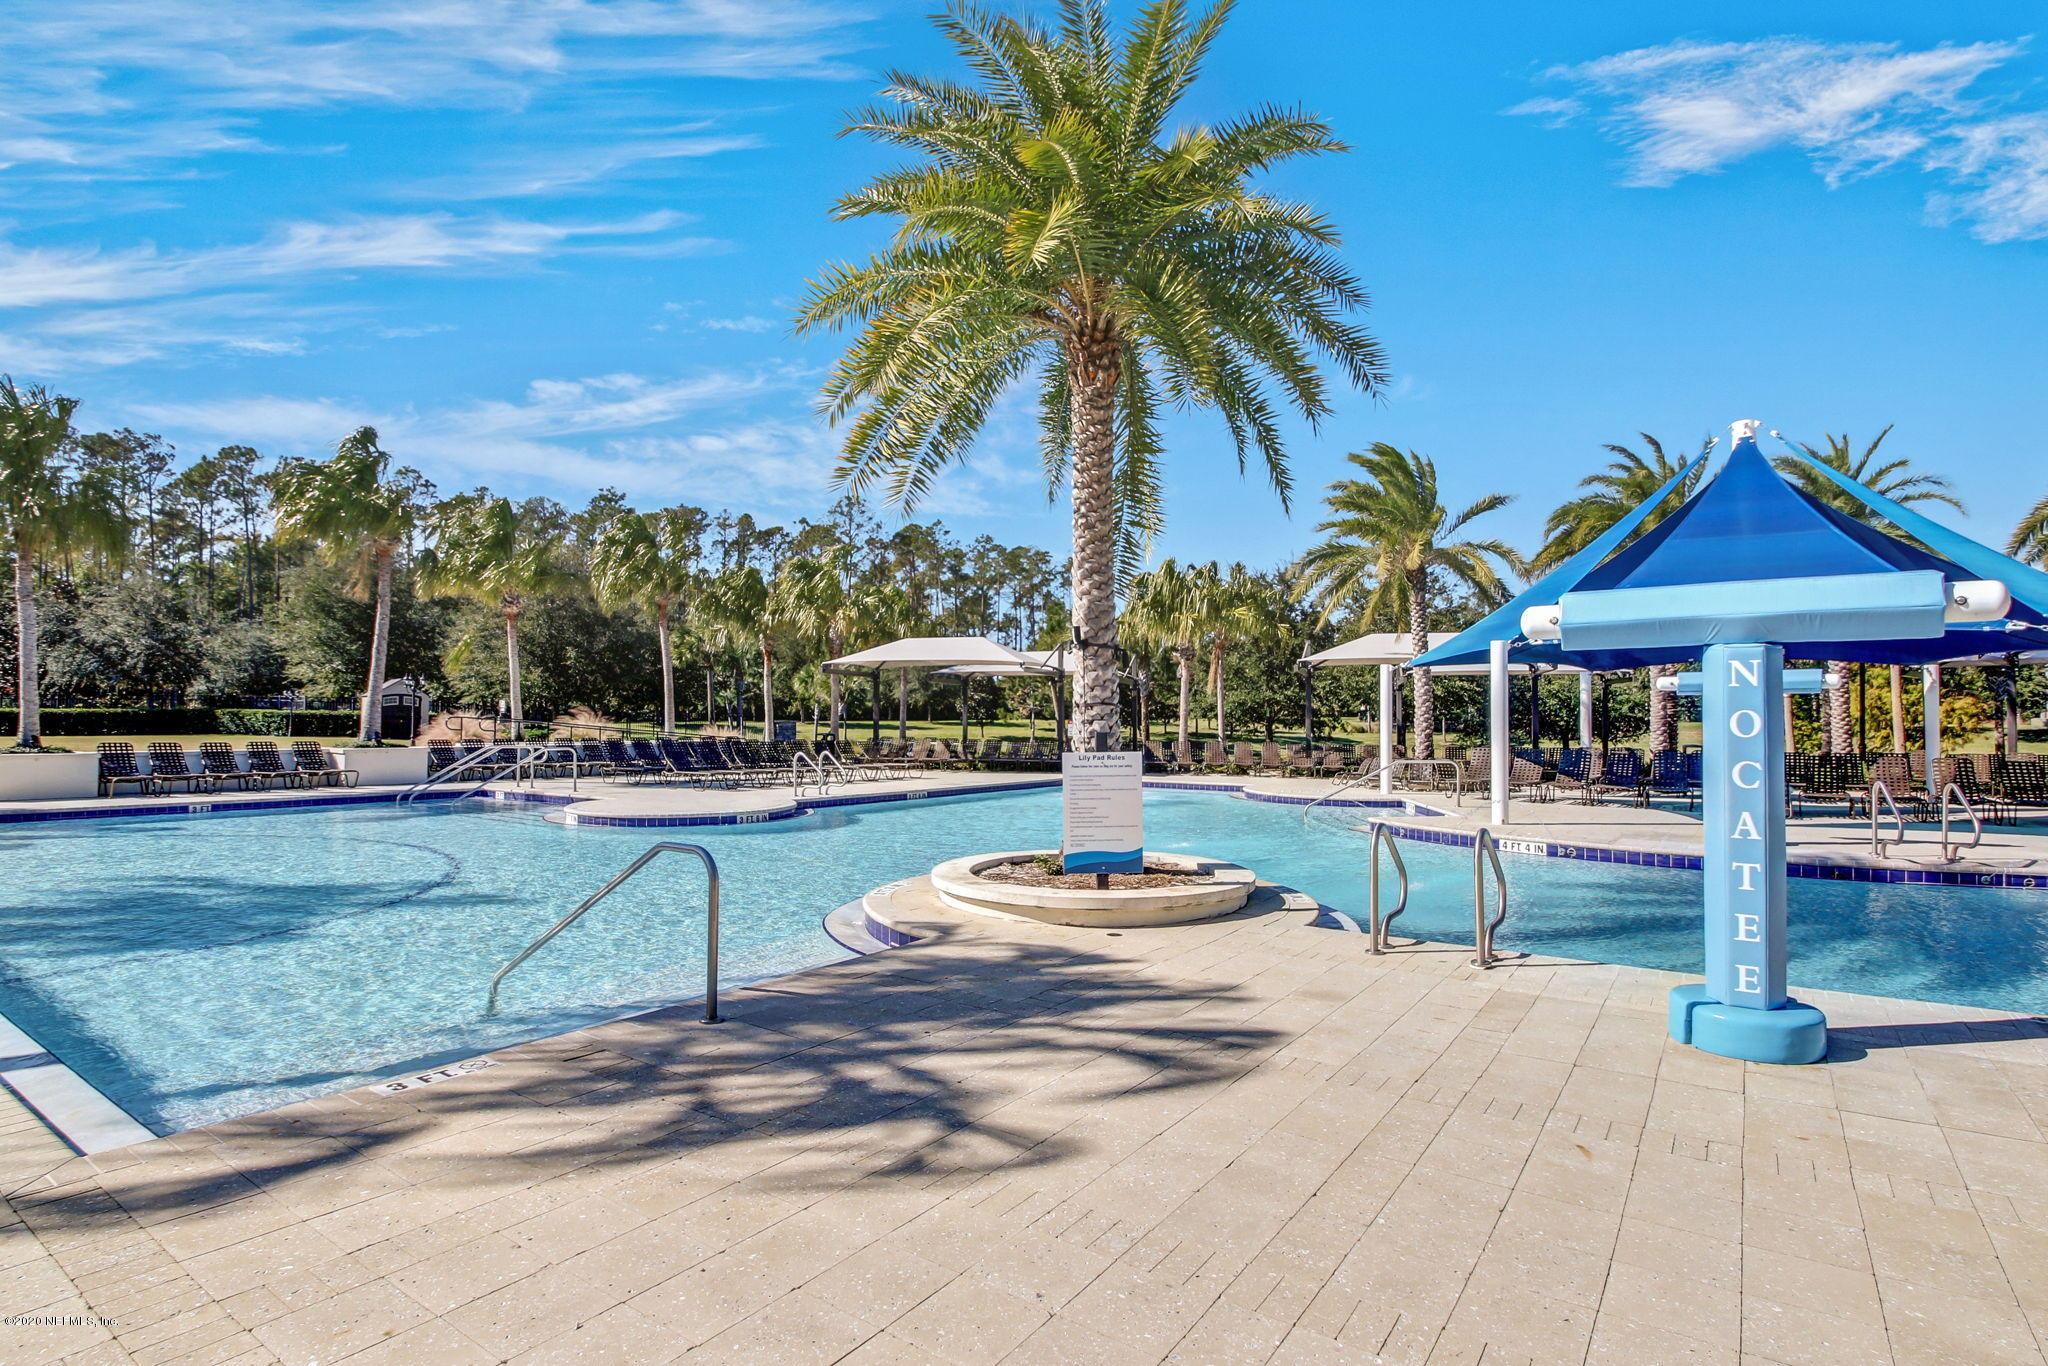 278 KIWI PALM, PONTE VEDRA, FLORIDA 32081, 5 Bedrooms Bedrooms, ,5 BathroomsBathrooms,Residential,For sale,KIWI PALM,1044196